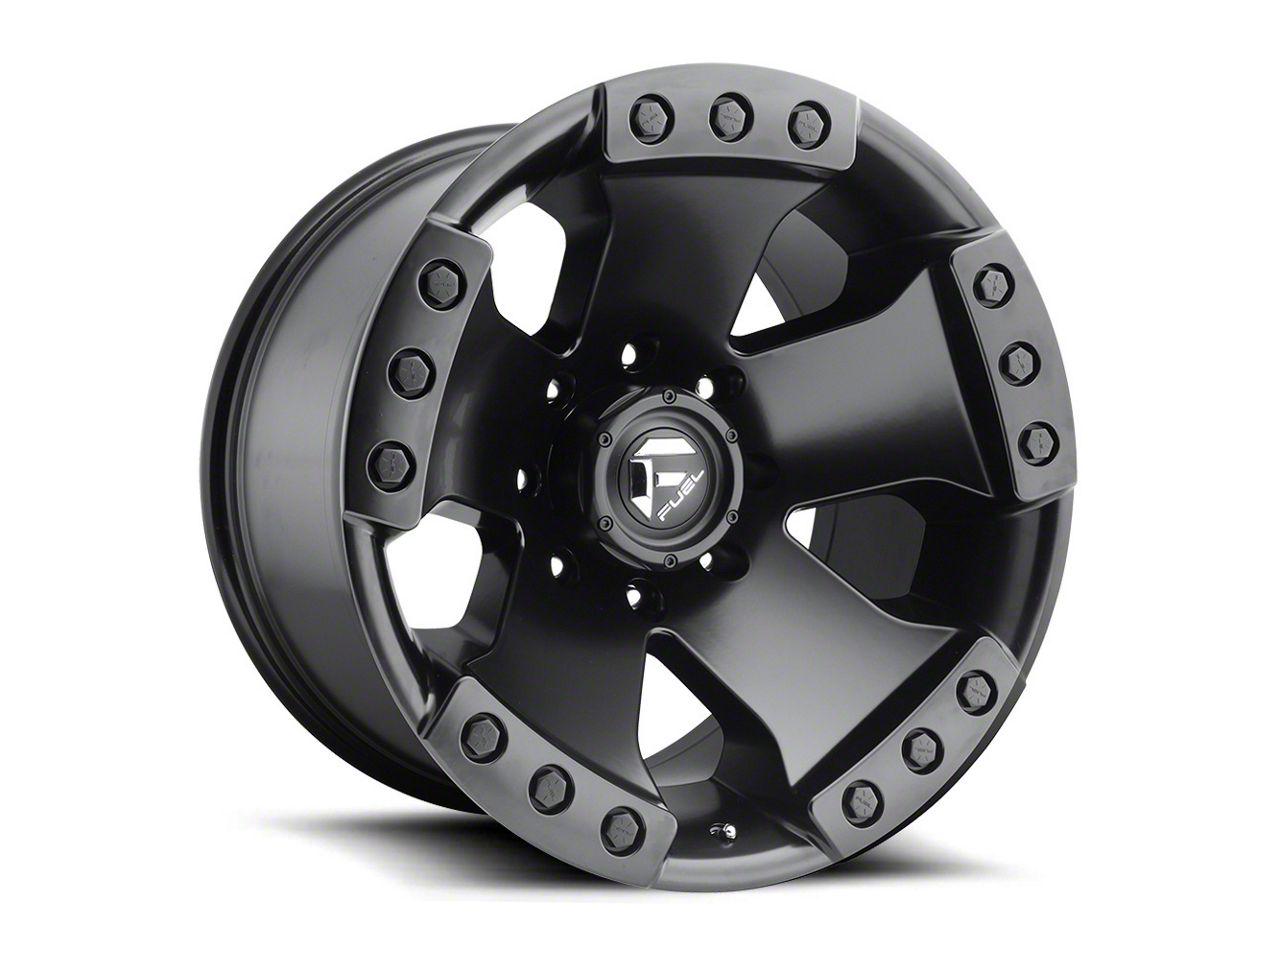 Fuel Wheels Monsta Matte Black 6-Lug Wheel - 20x10 (99-18 Silverado 1500)